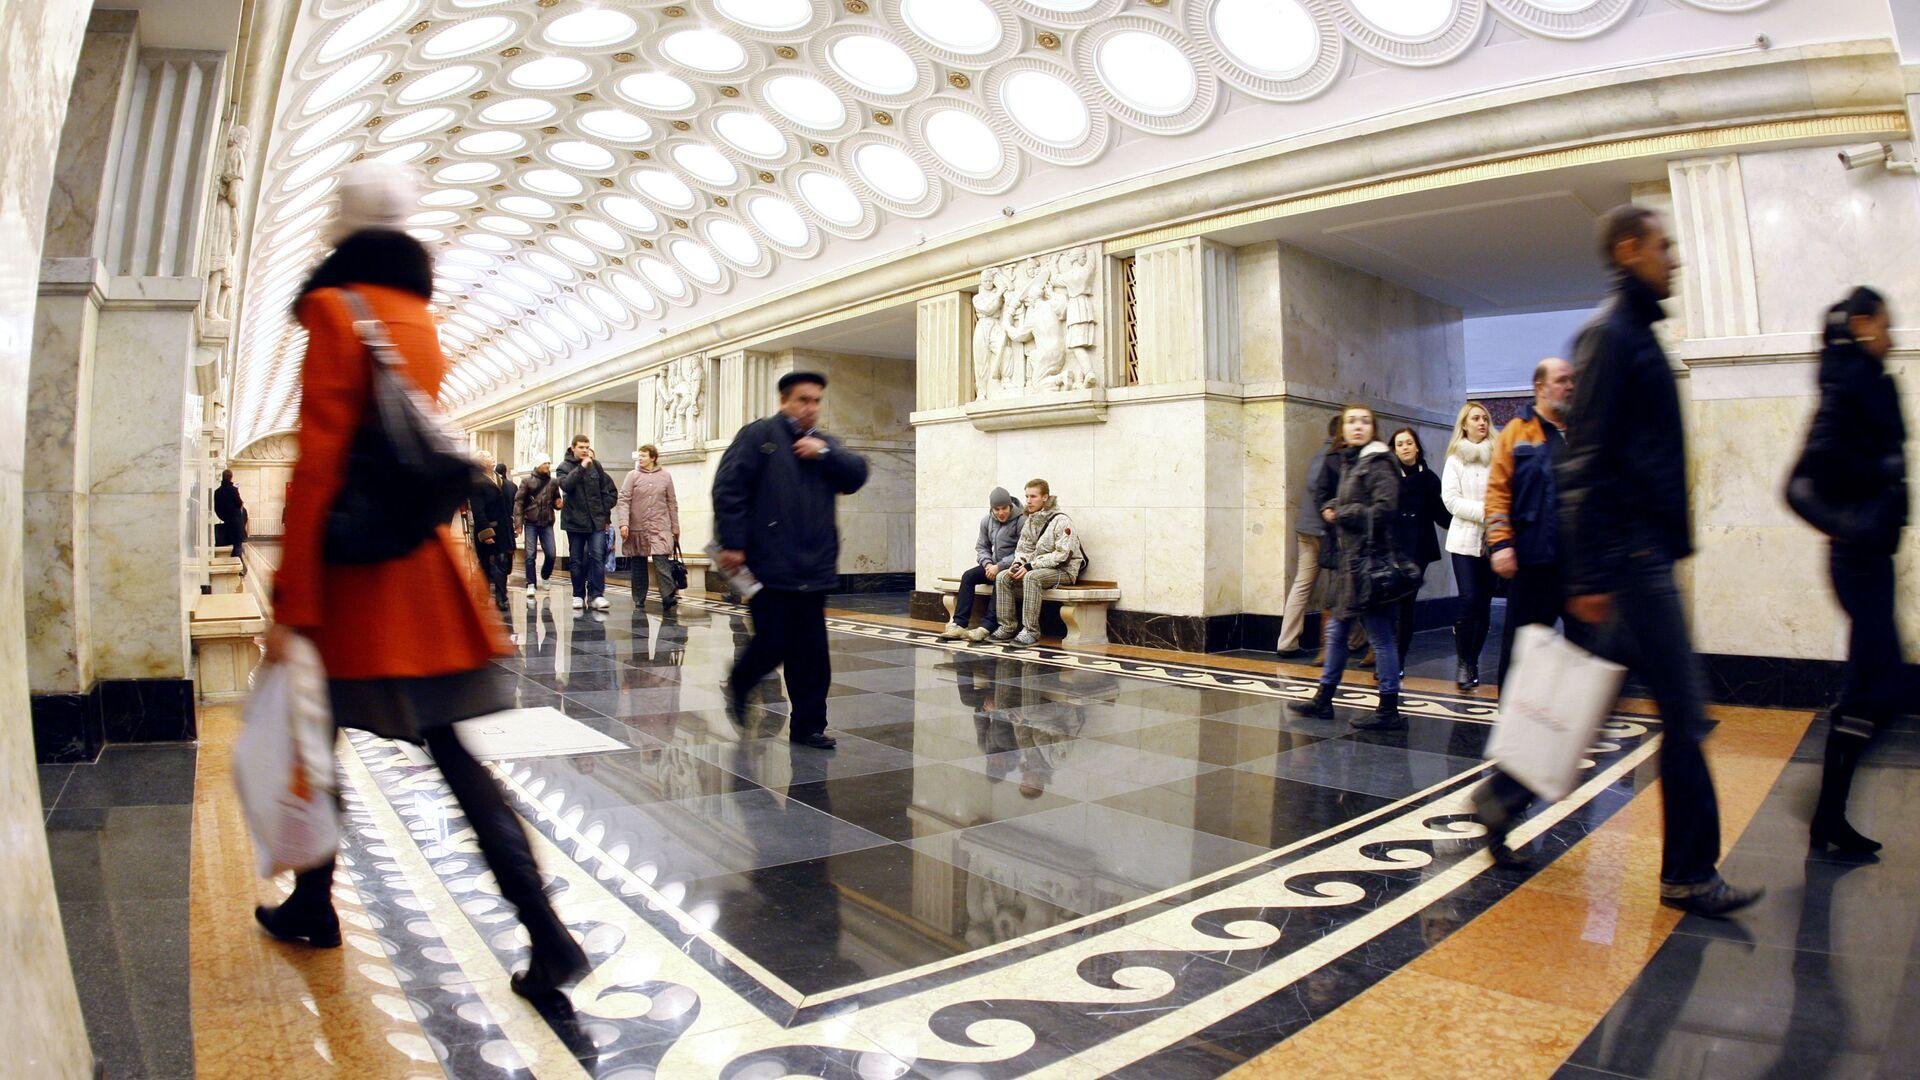 La stazione della metro di Mosca Elektrozavodskaya. - Sputnik Italia, 1920, 22.05.2021